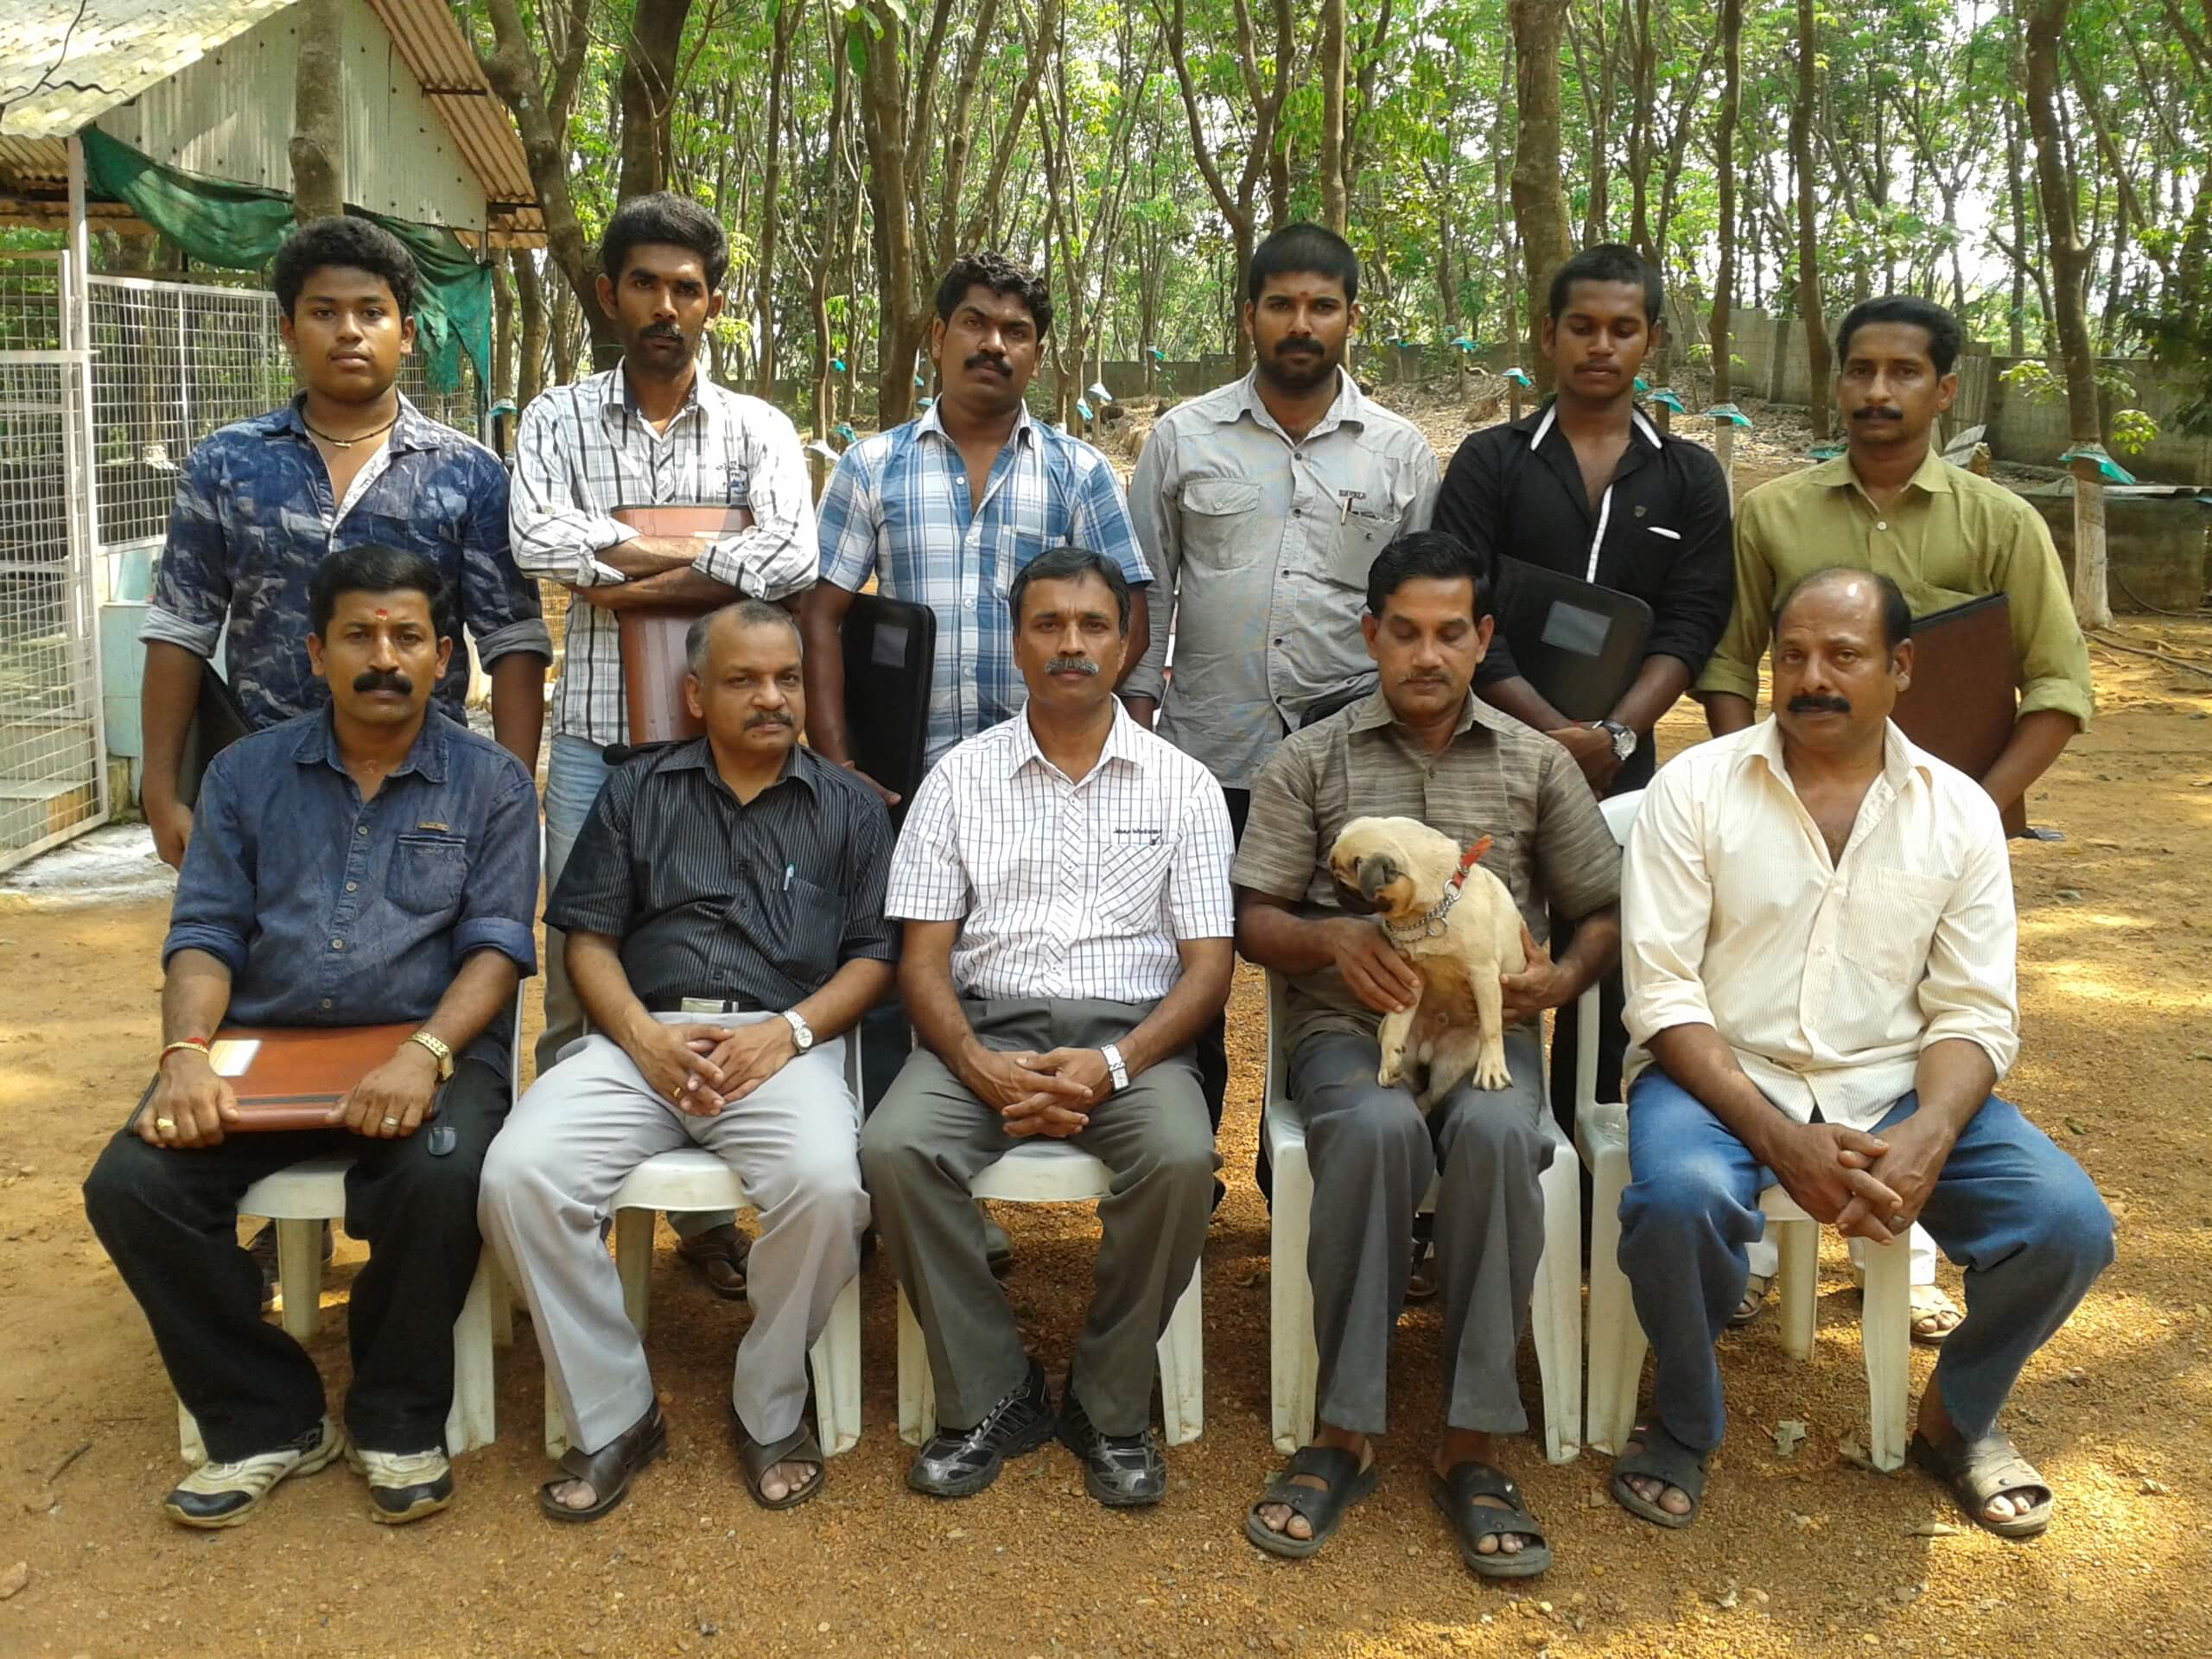 Dog Trainer Courses | Professional Pet Training Classes In